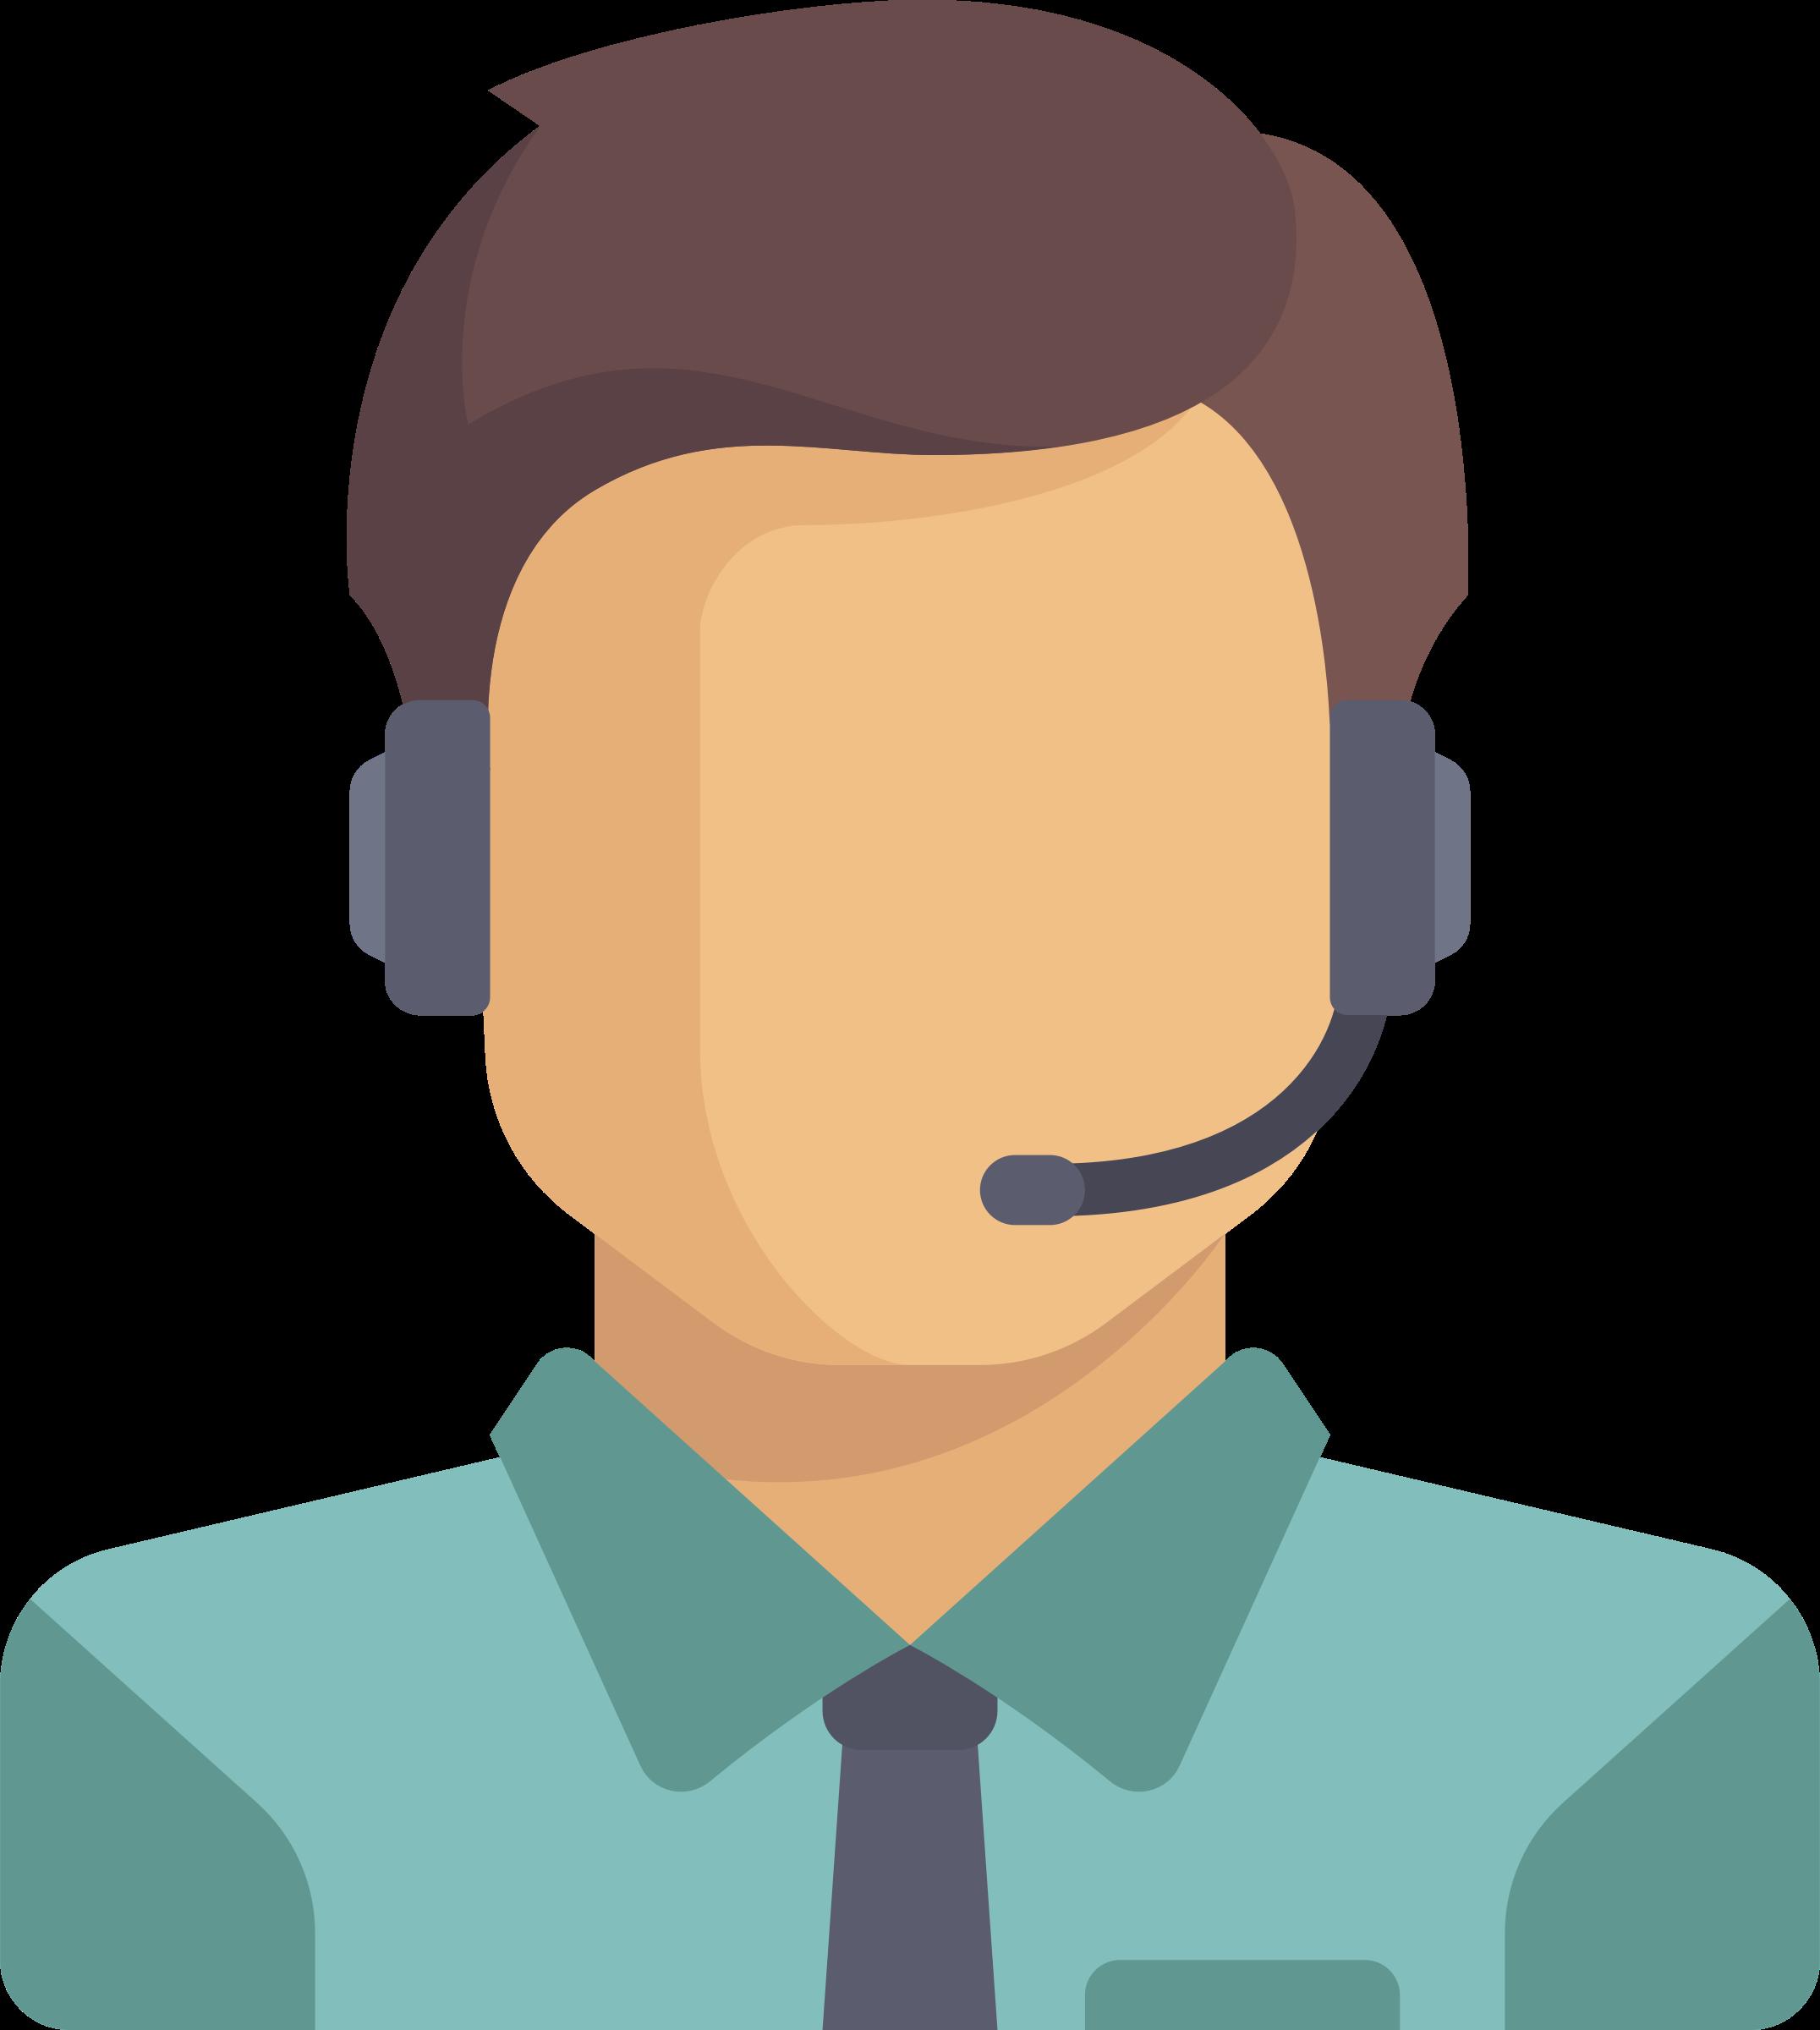 Customer servicr big image. Phone clipart telemarketer